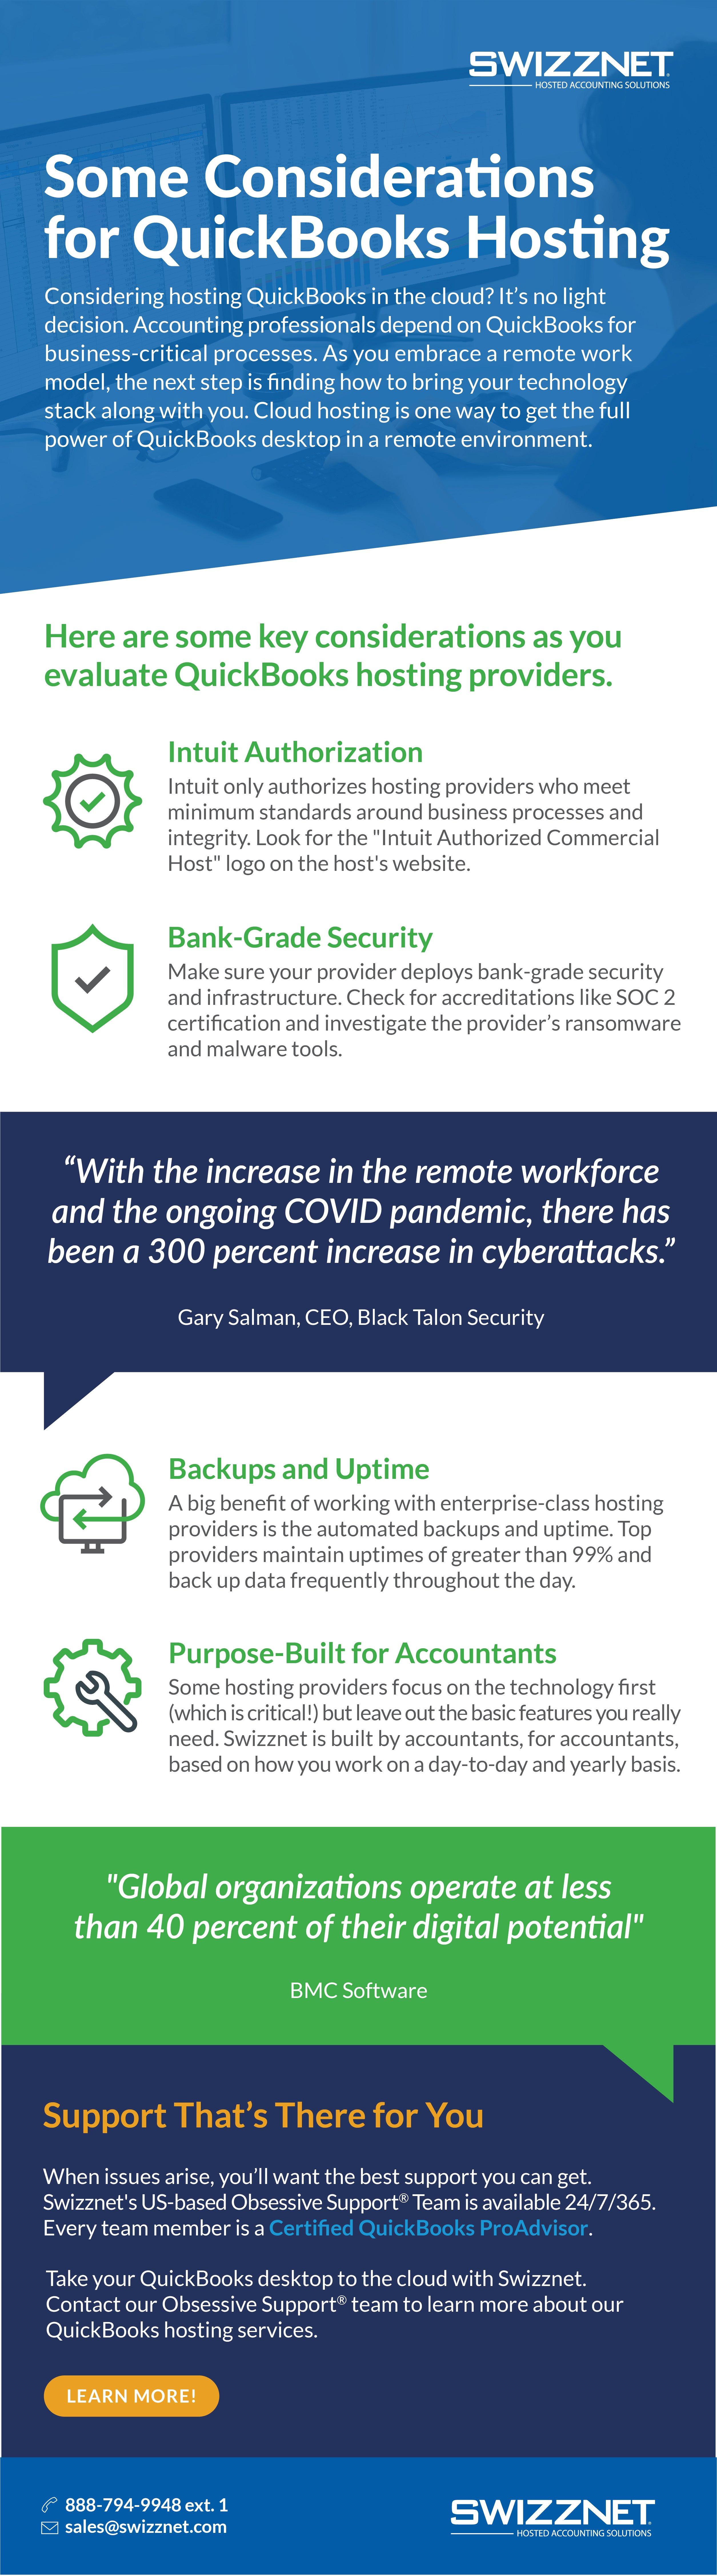 Swizznet_Quickbooks_Hosting_Infographic